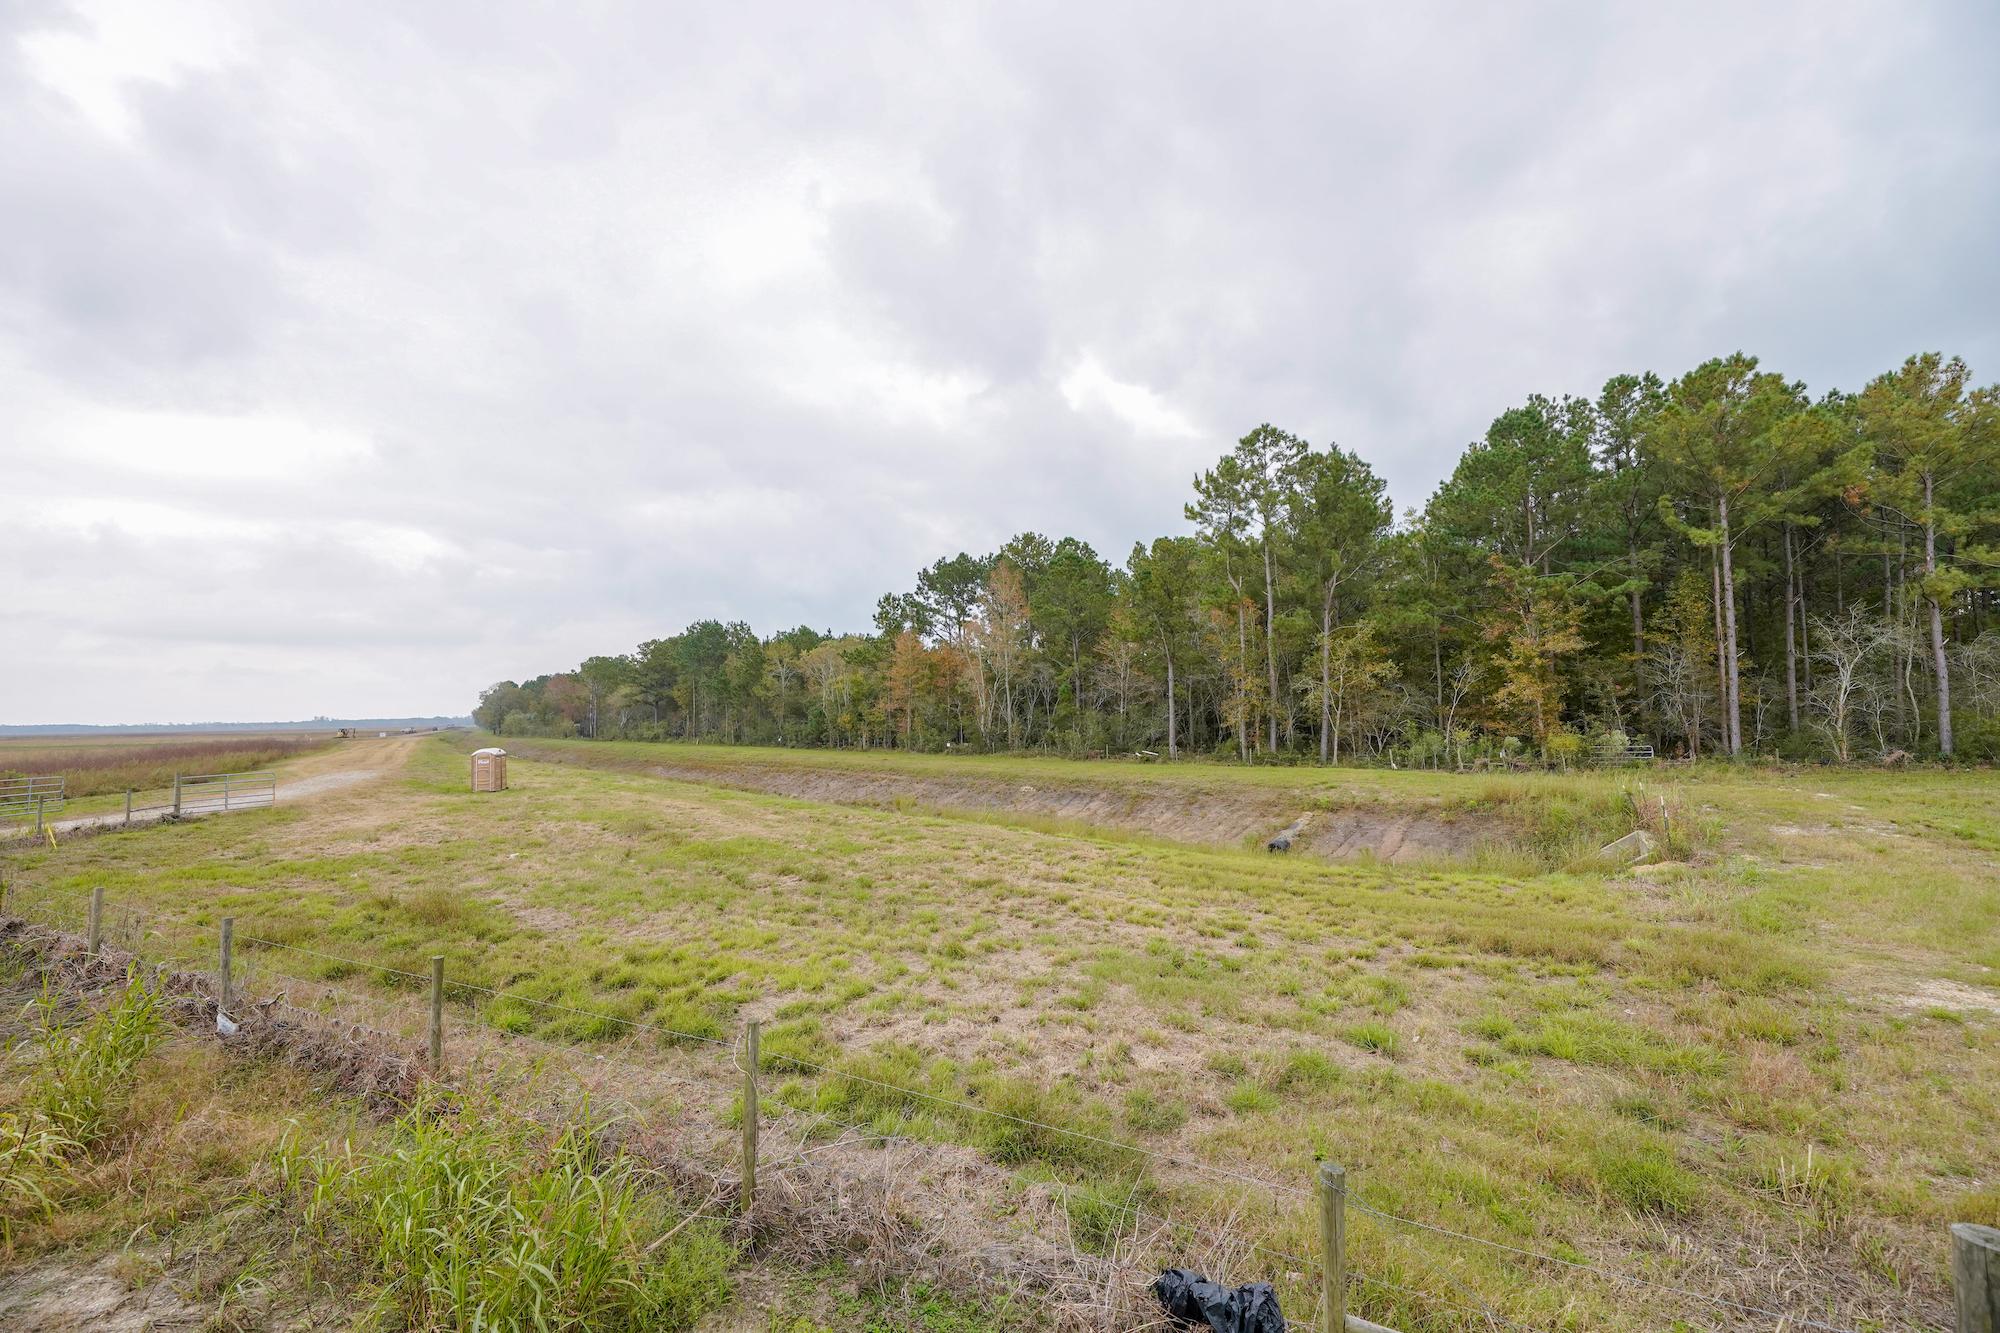 Jefferson County Development Land - Image 10 of 36